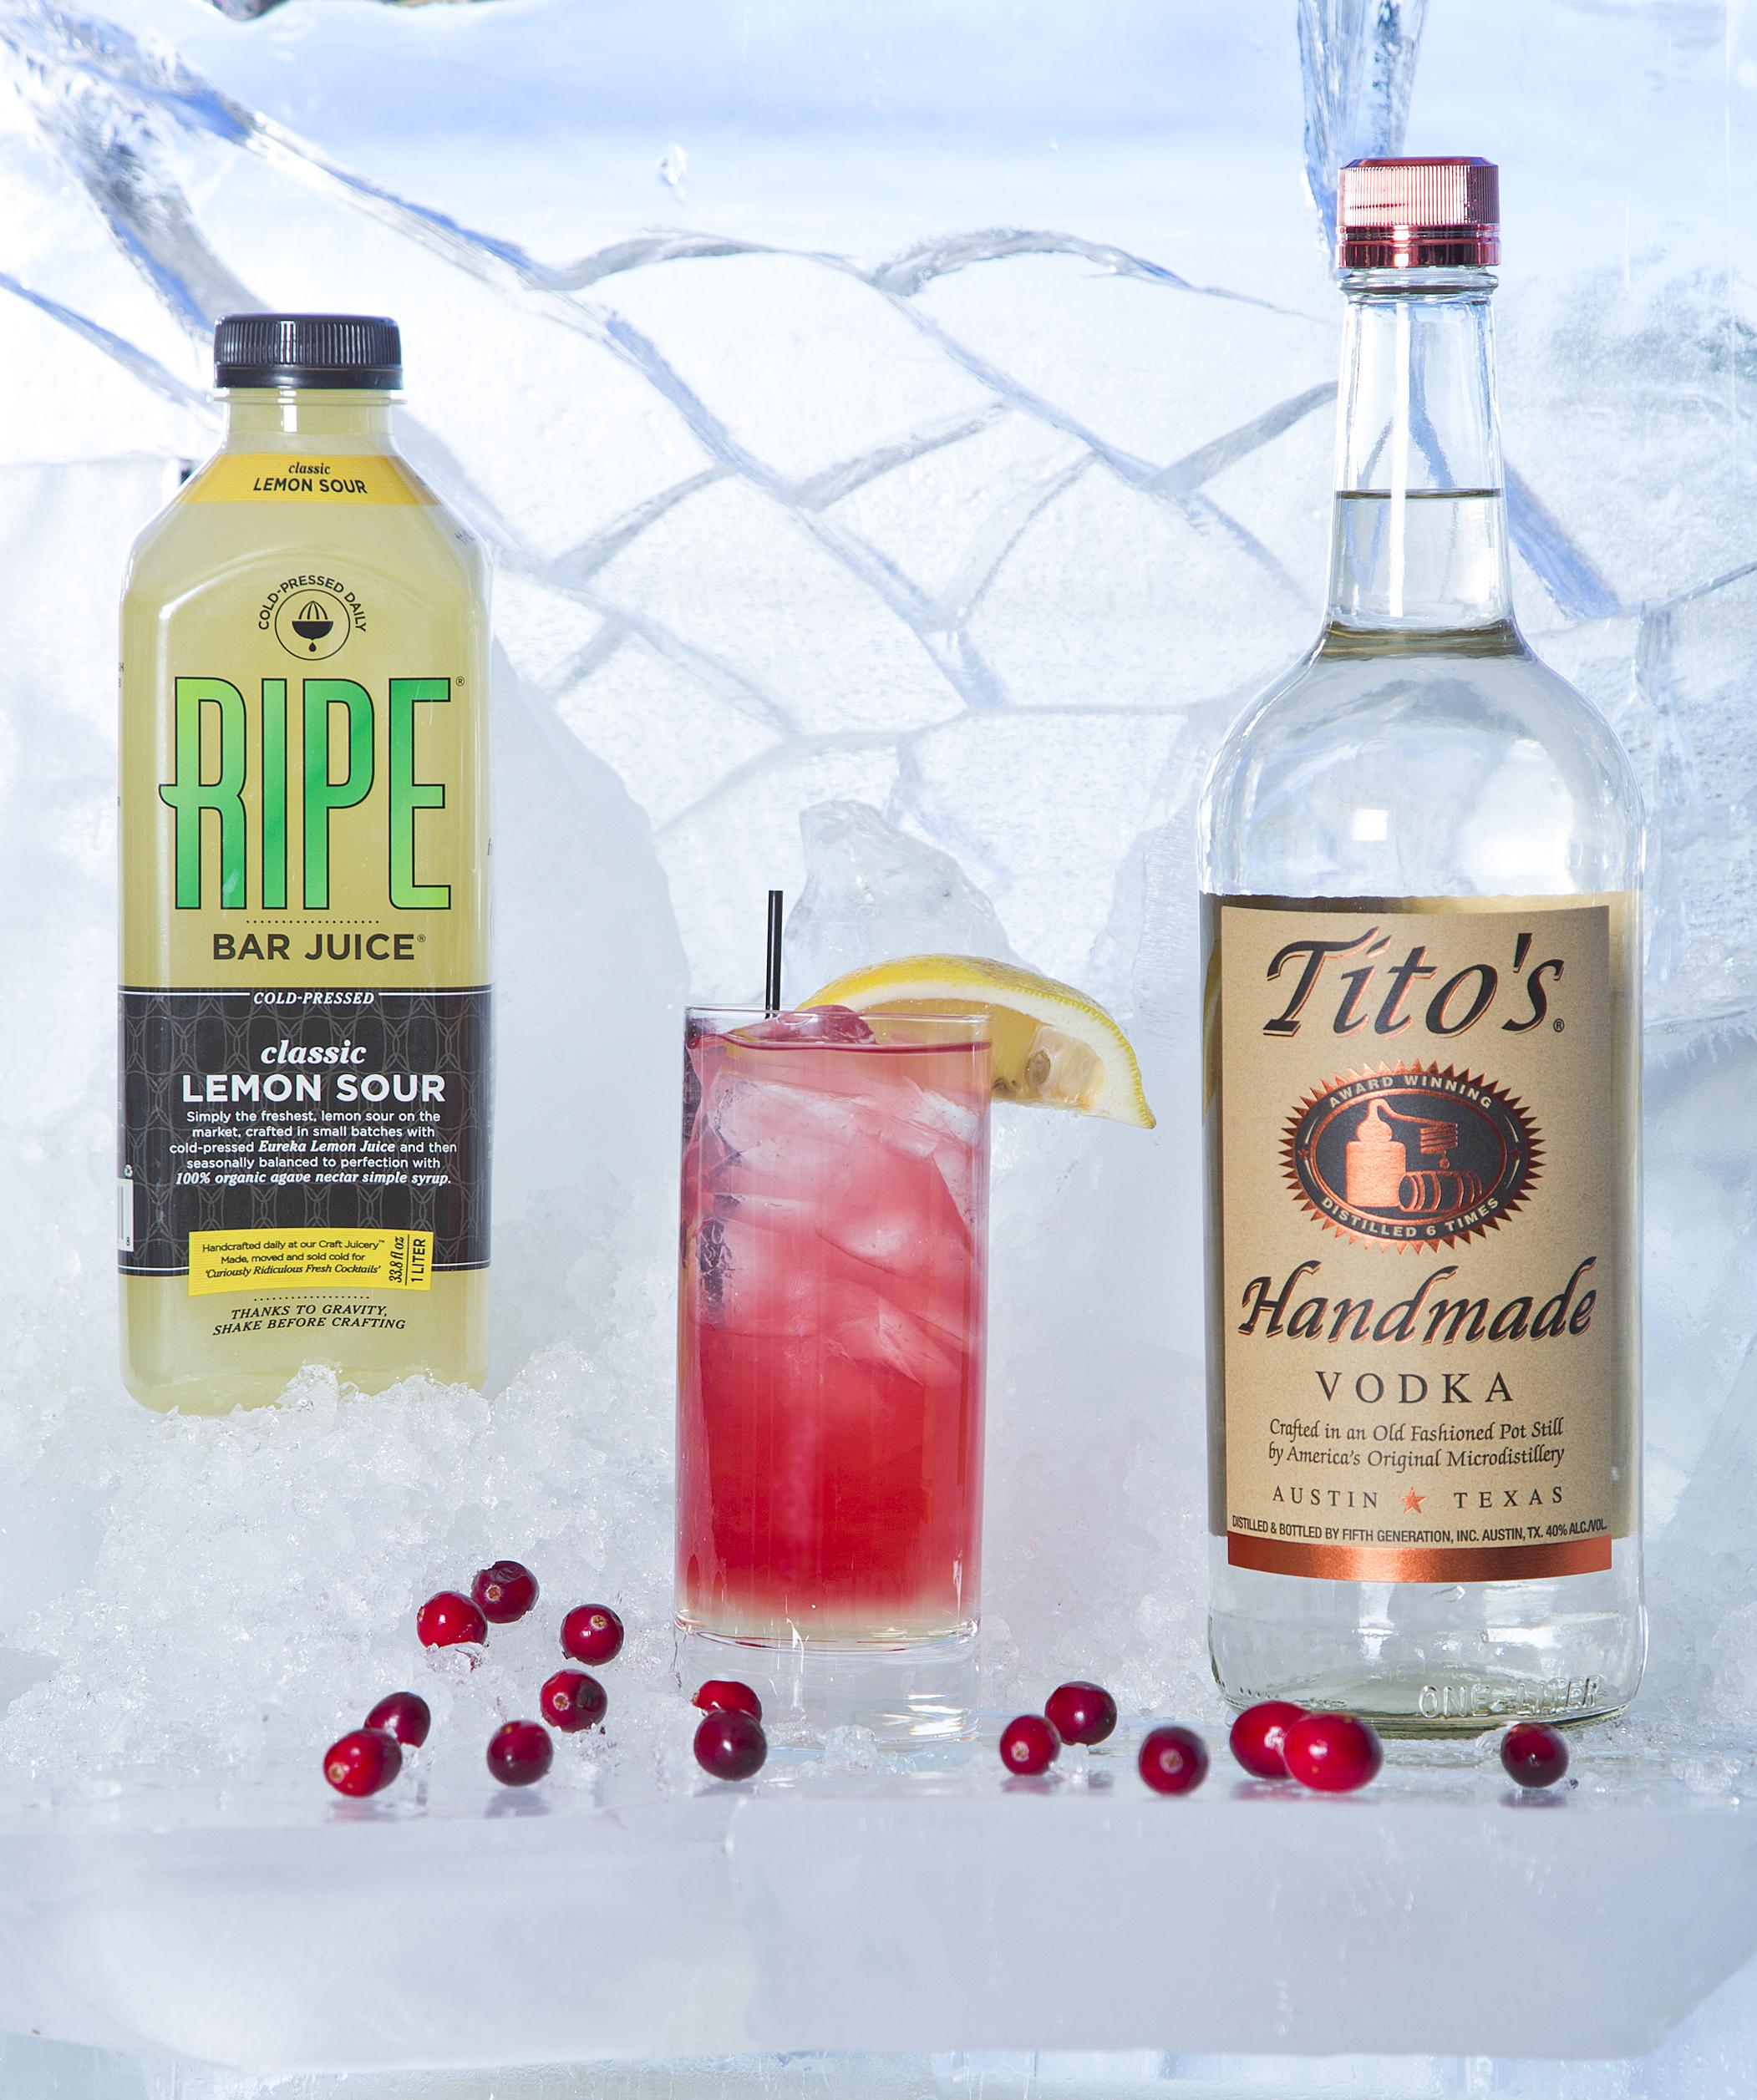 Samoset-Ice-Bar-2017-Cocktail-4.jpg